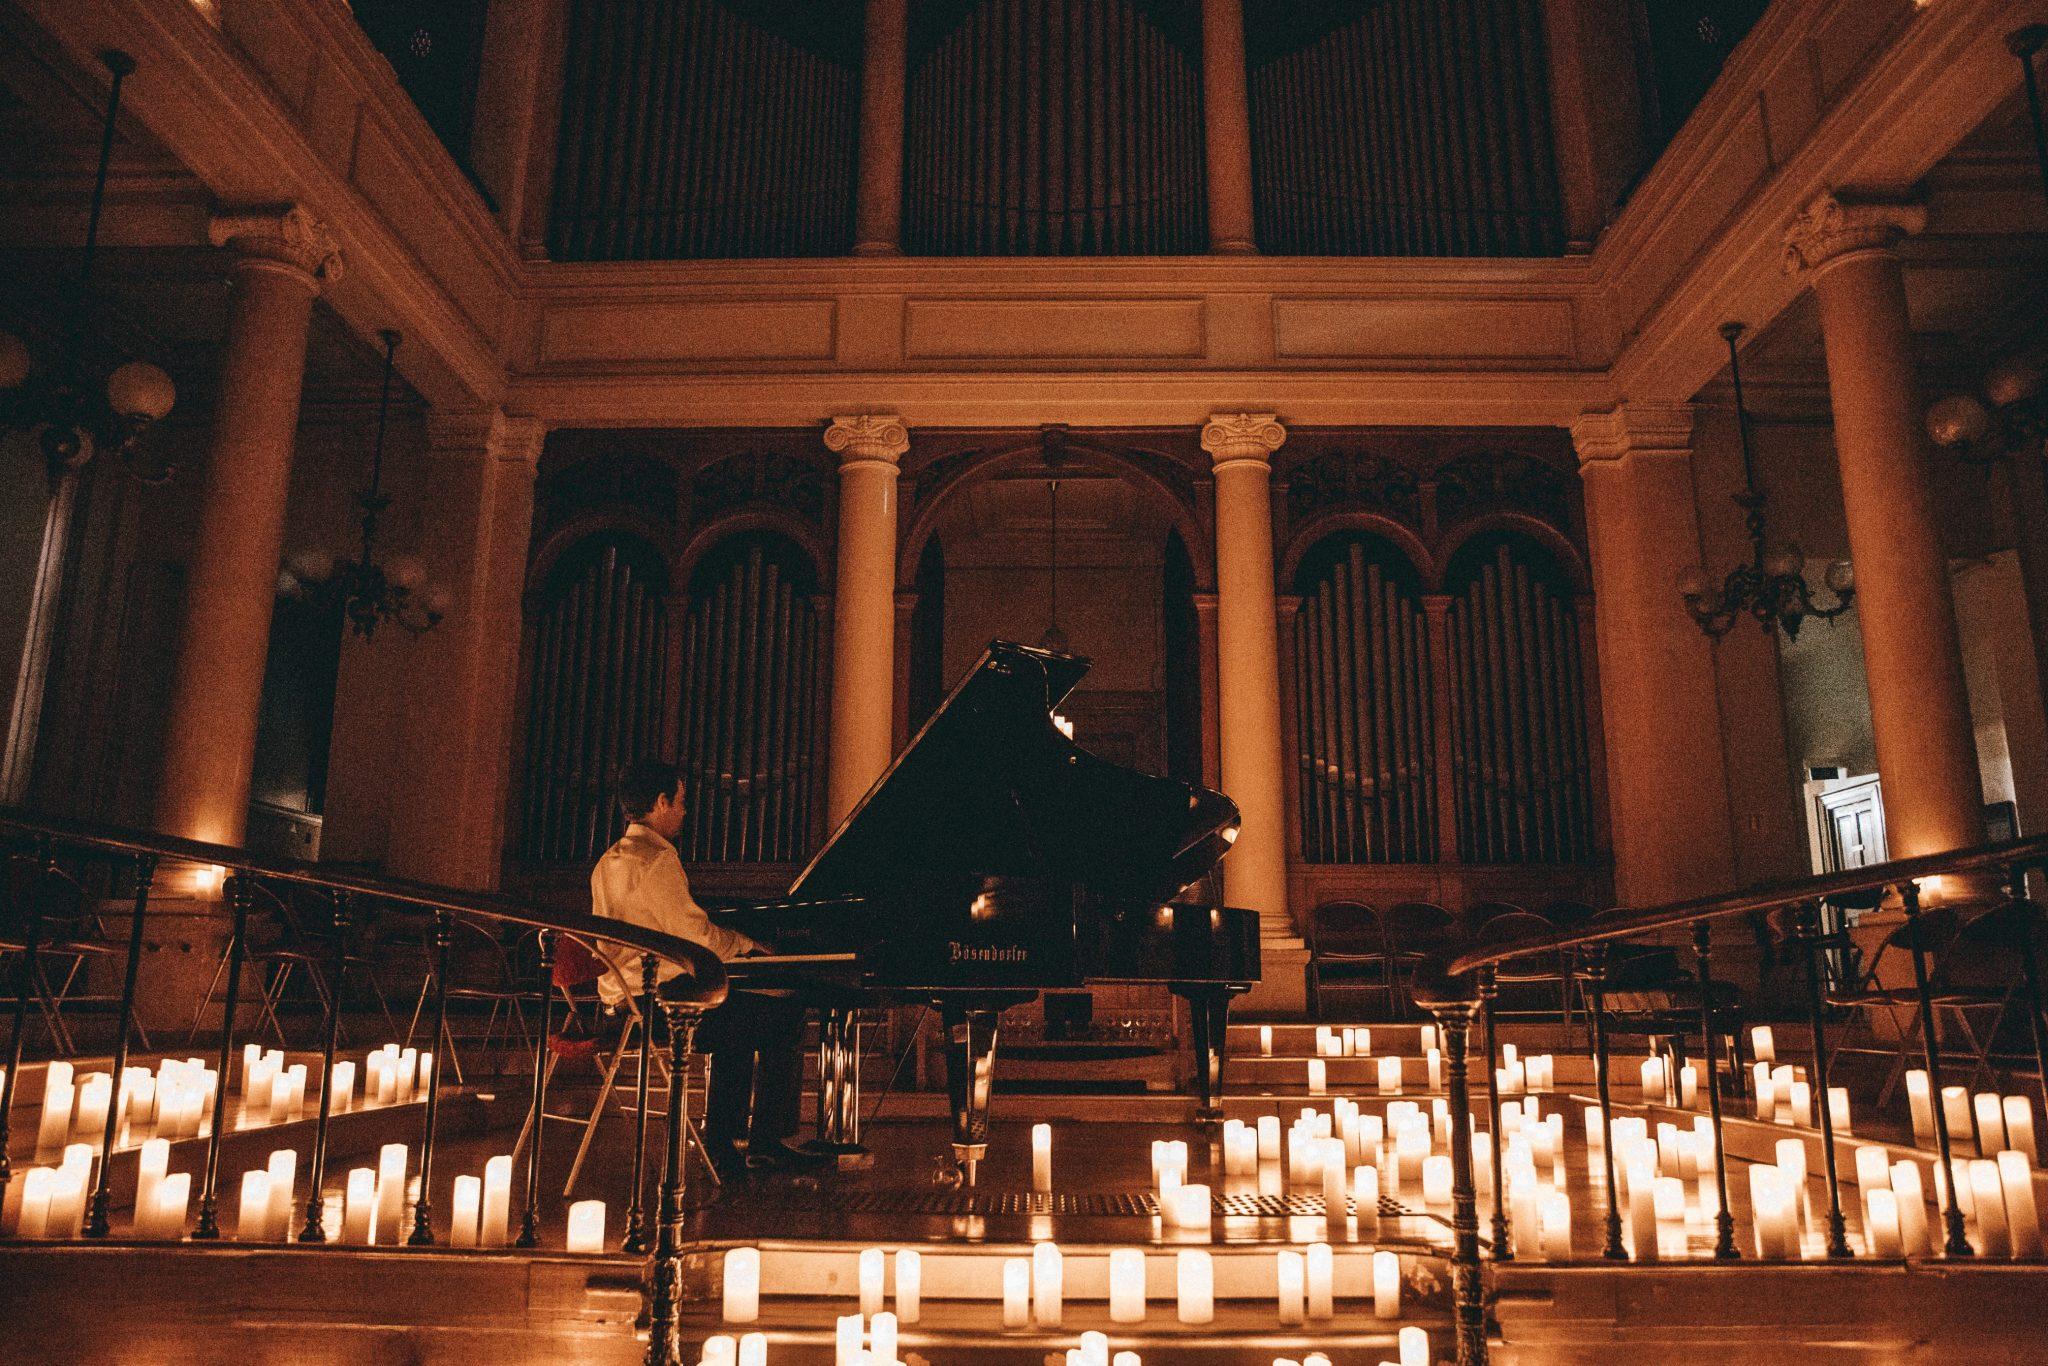 inja concert candlelight paris institut national jeunes aveugles musique classique